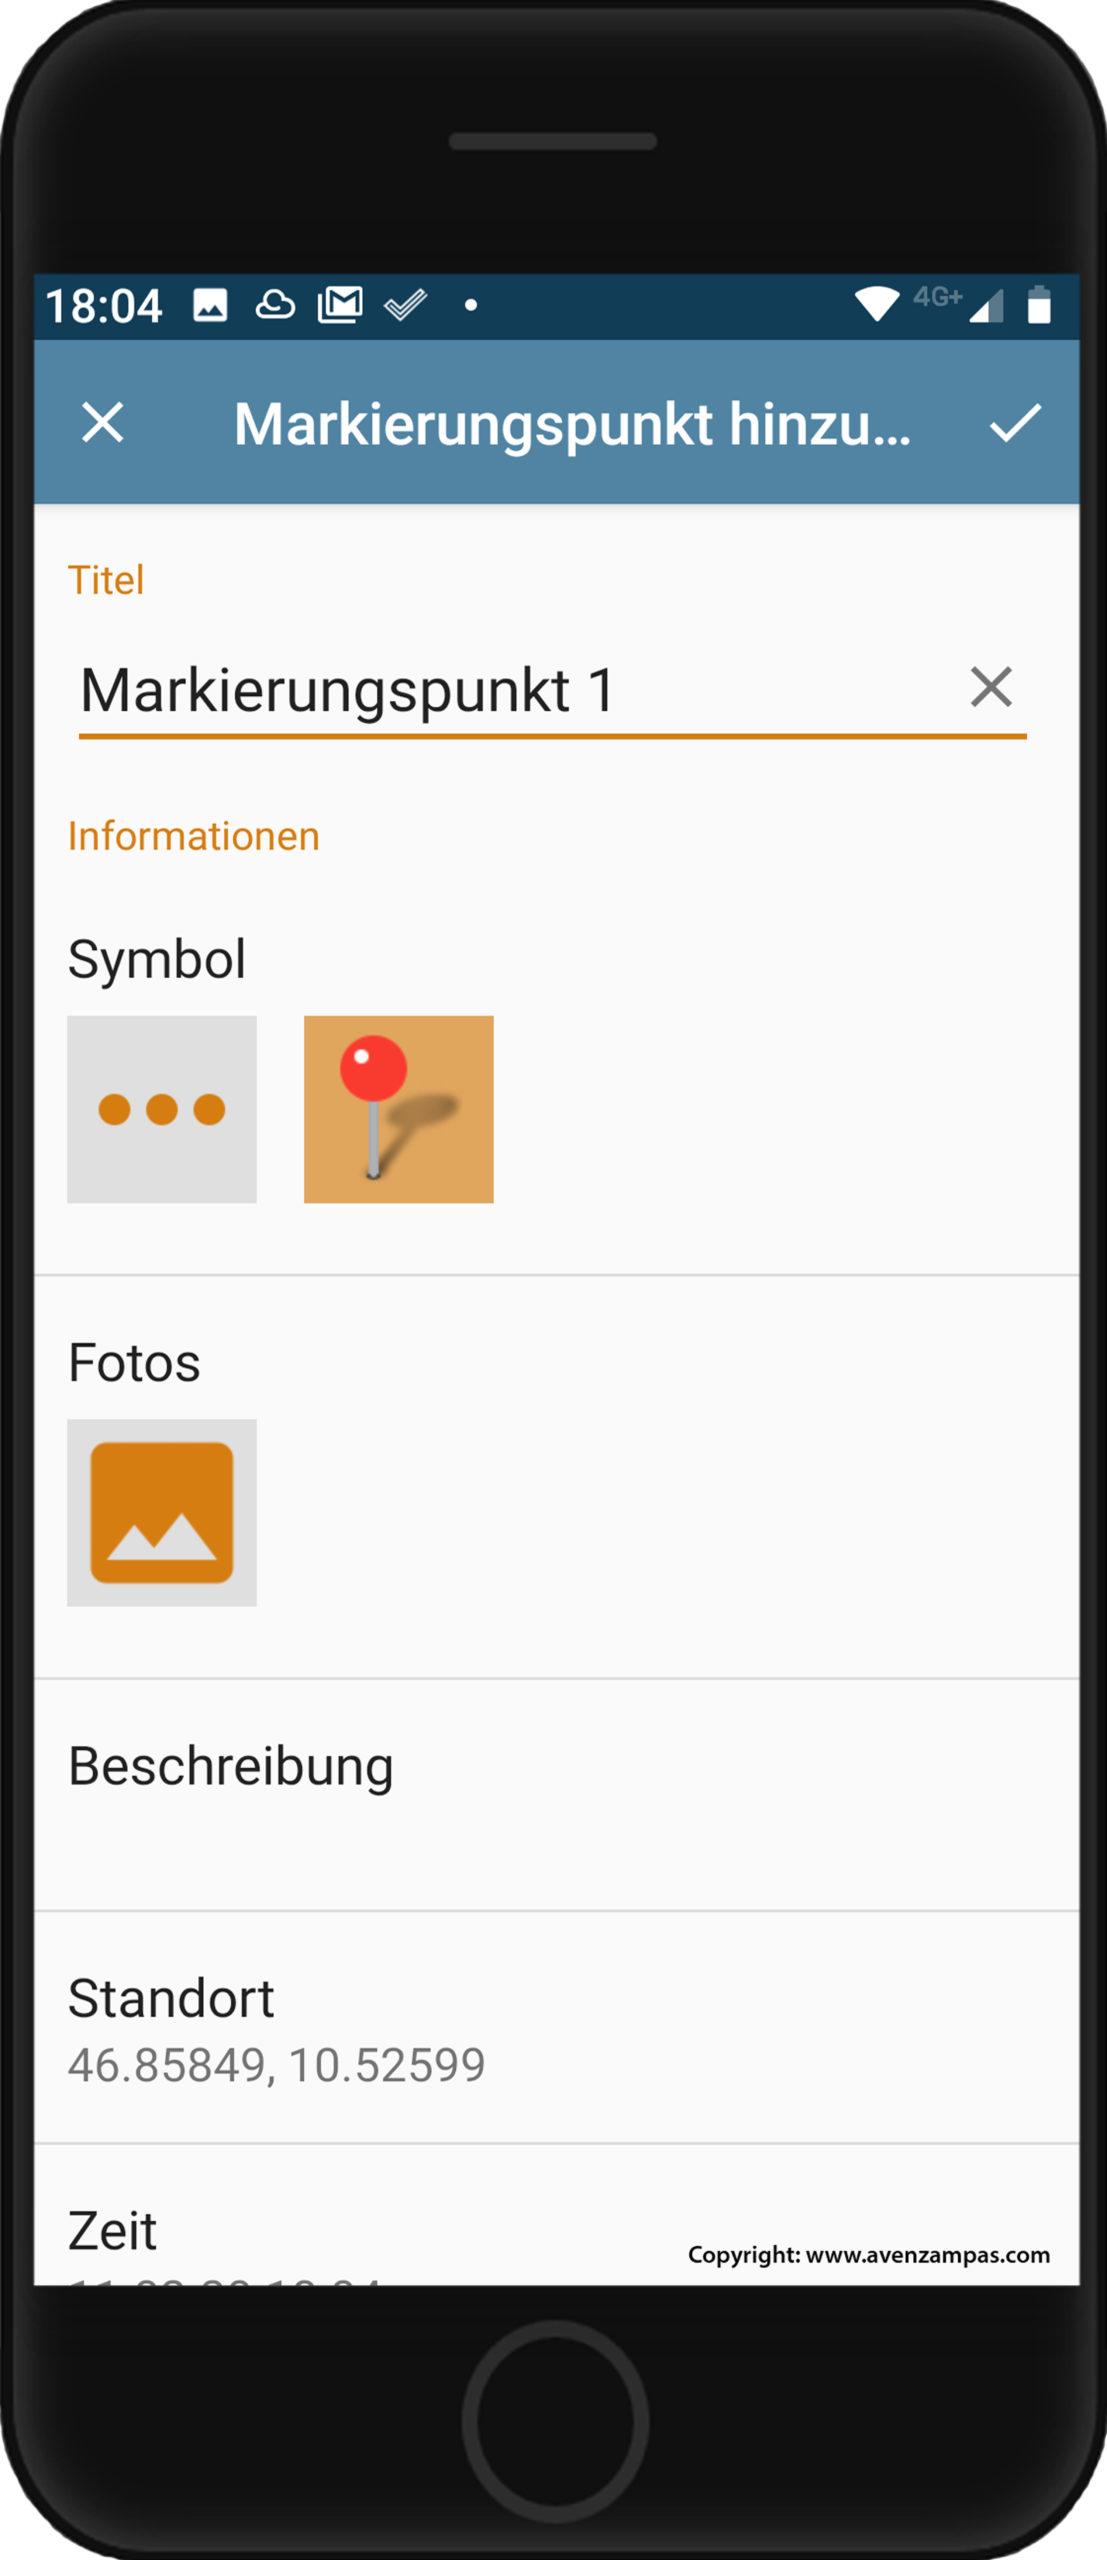 Grundkarte panoMap Smartphone Avenzamaps Markierungspunkt Copyright